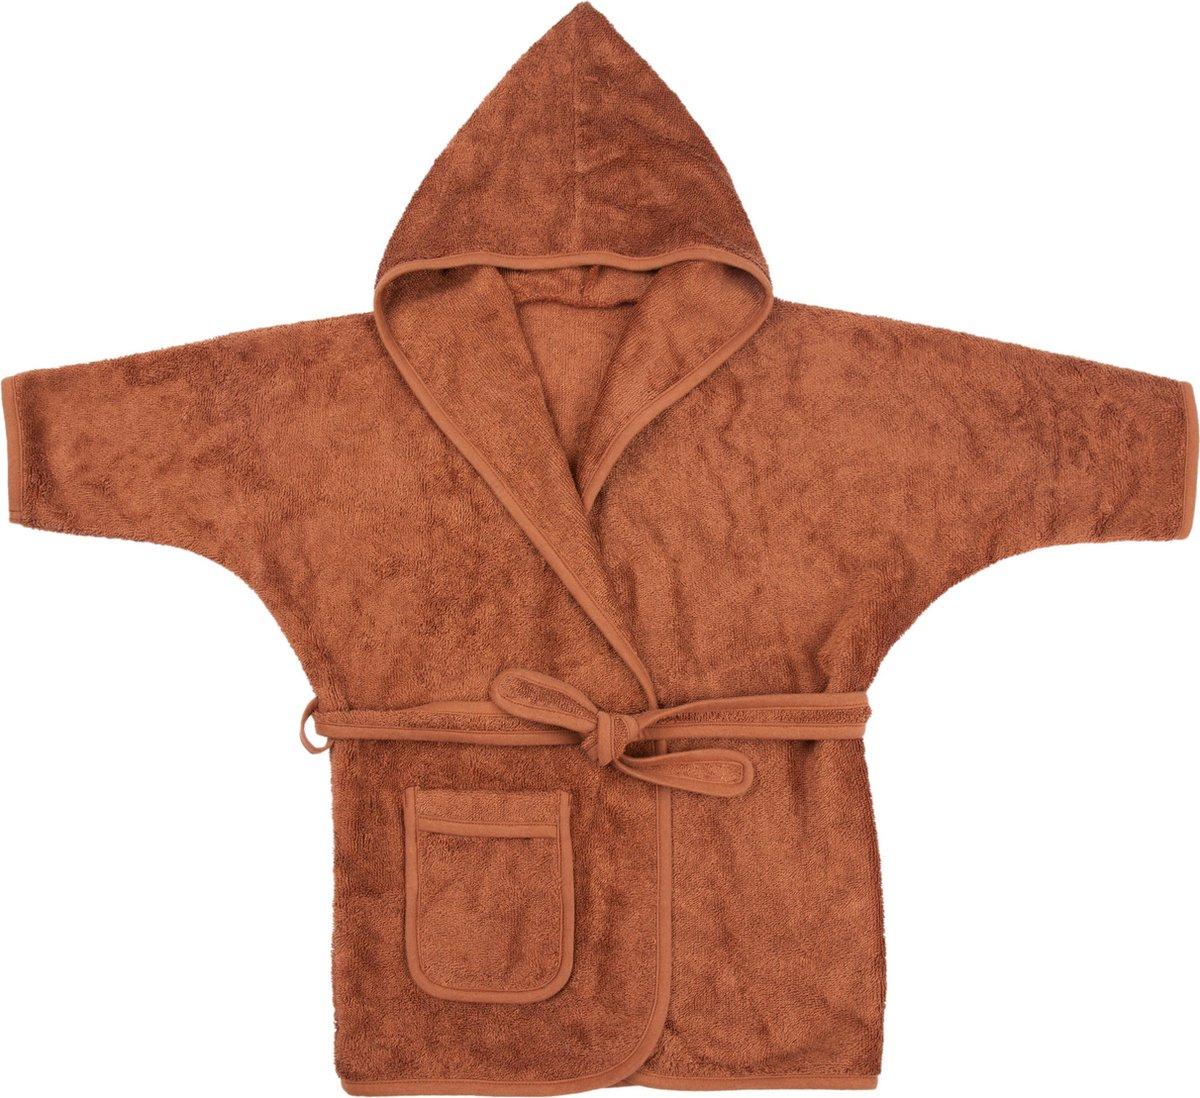 Timboo Badjas kind Hazel Brown 8/10 jaar - Bamboe - Extra zacht - Kinderbadjas - Hazelnootbruin